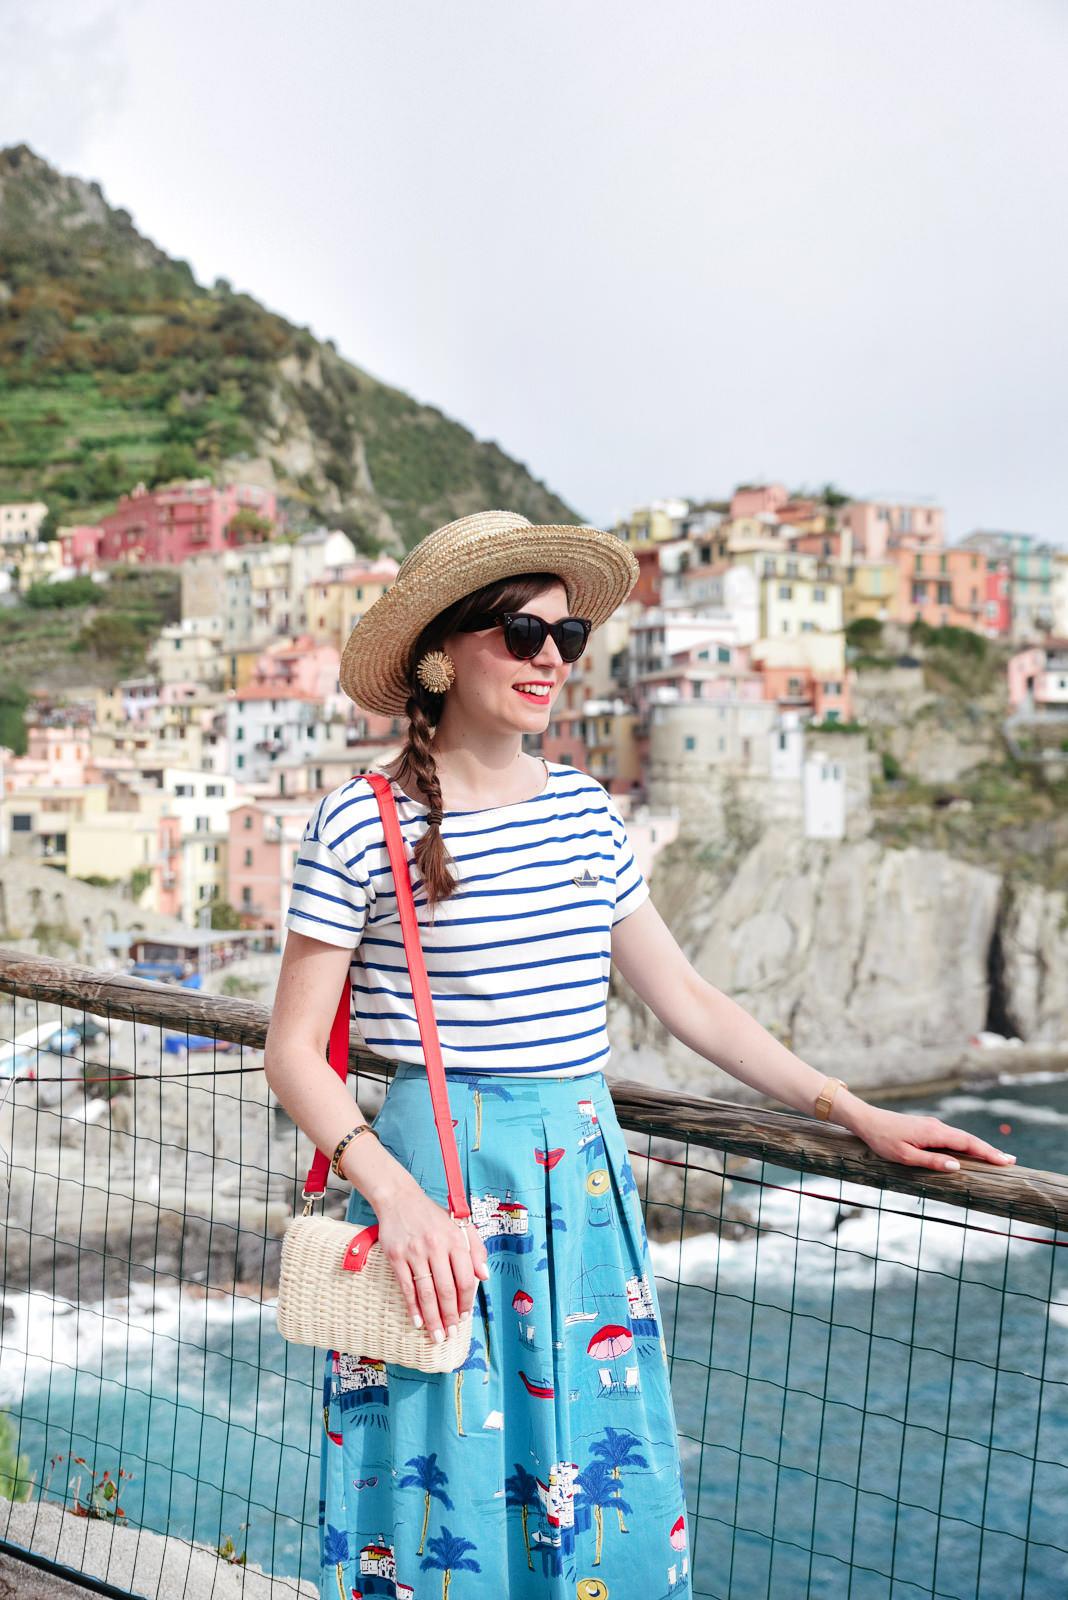 Blog-Mode-And-The-City-Lifestyle-Italie-Sestri-Levante-Cinque-Terre-16